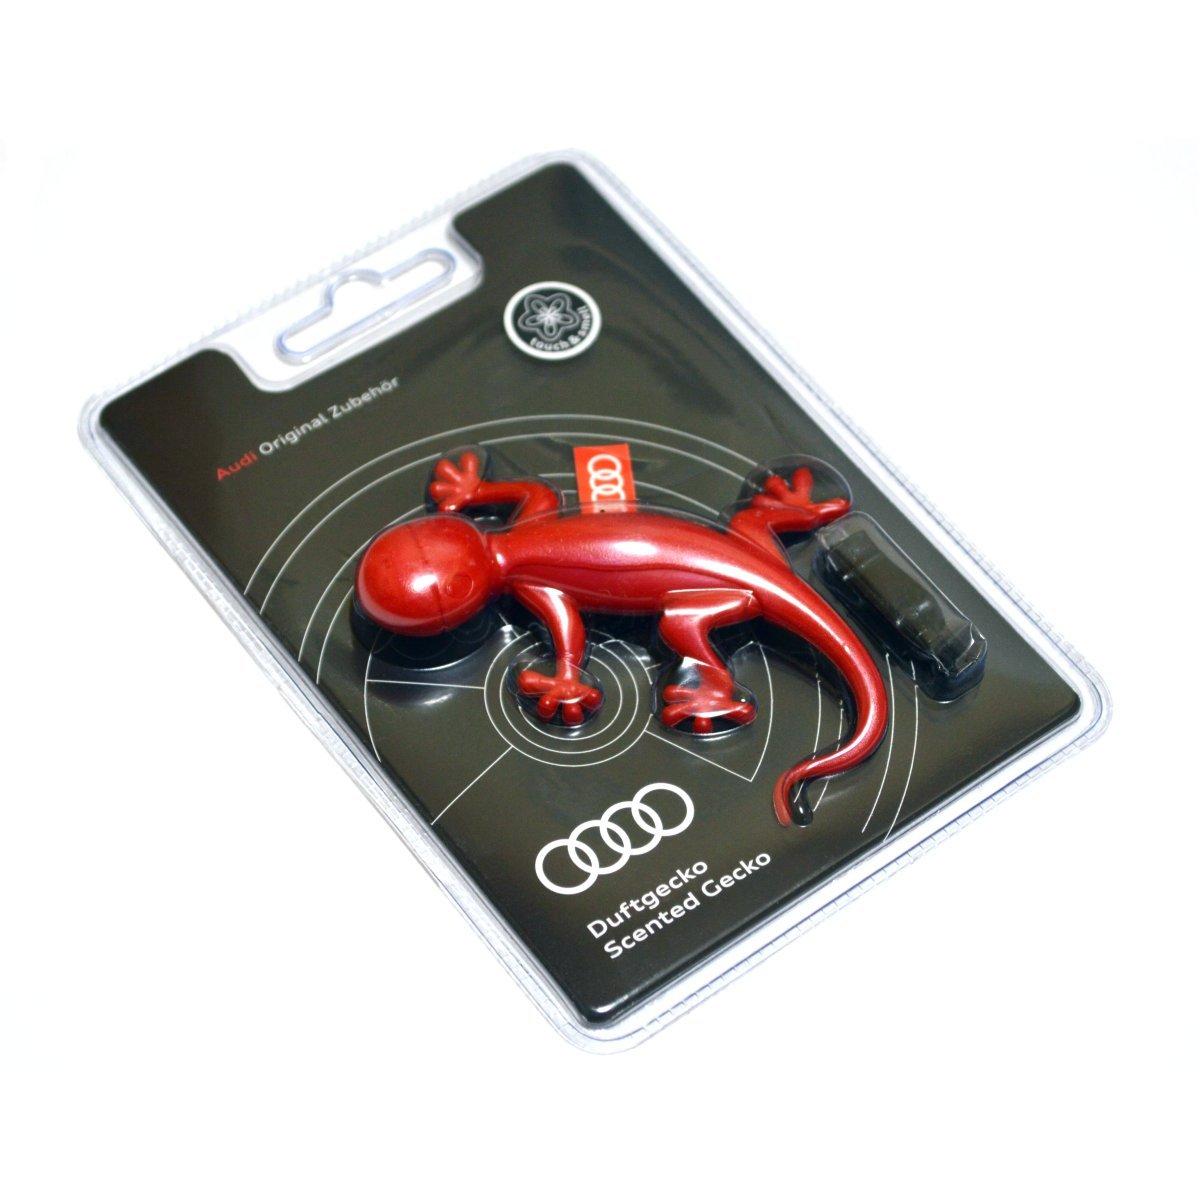 Original Audi 000087009B Gecko Air Freshener Red Floral Fragrance